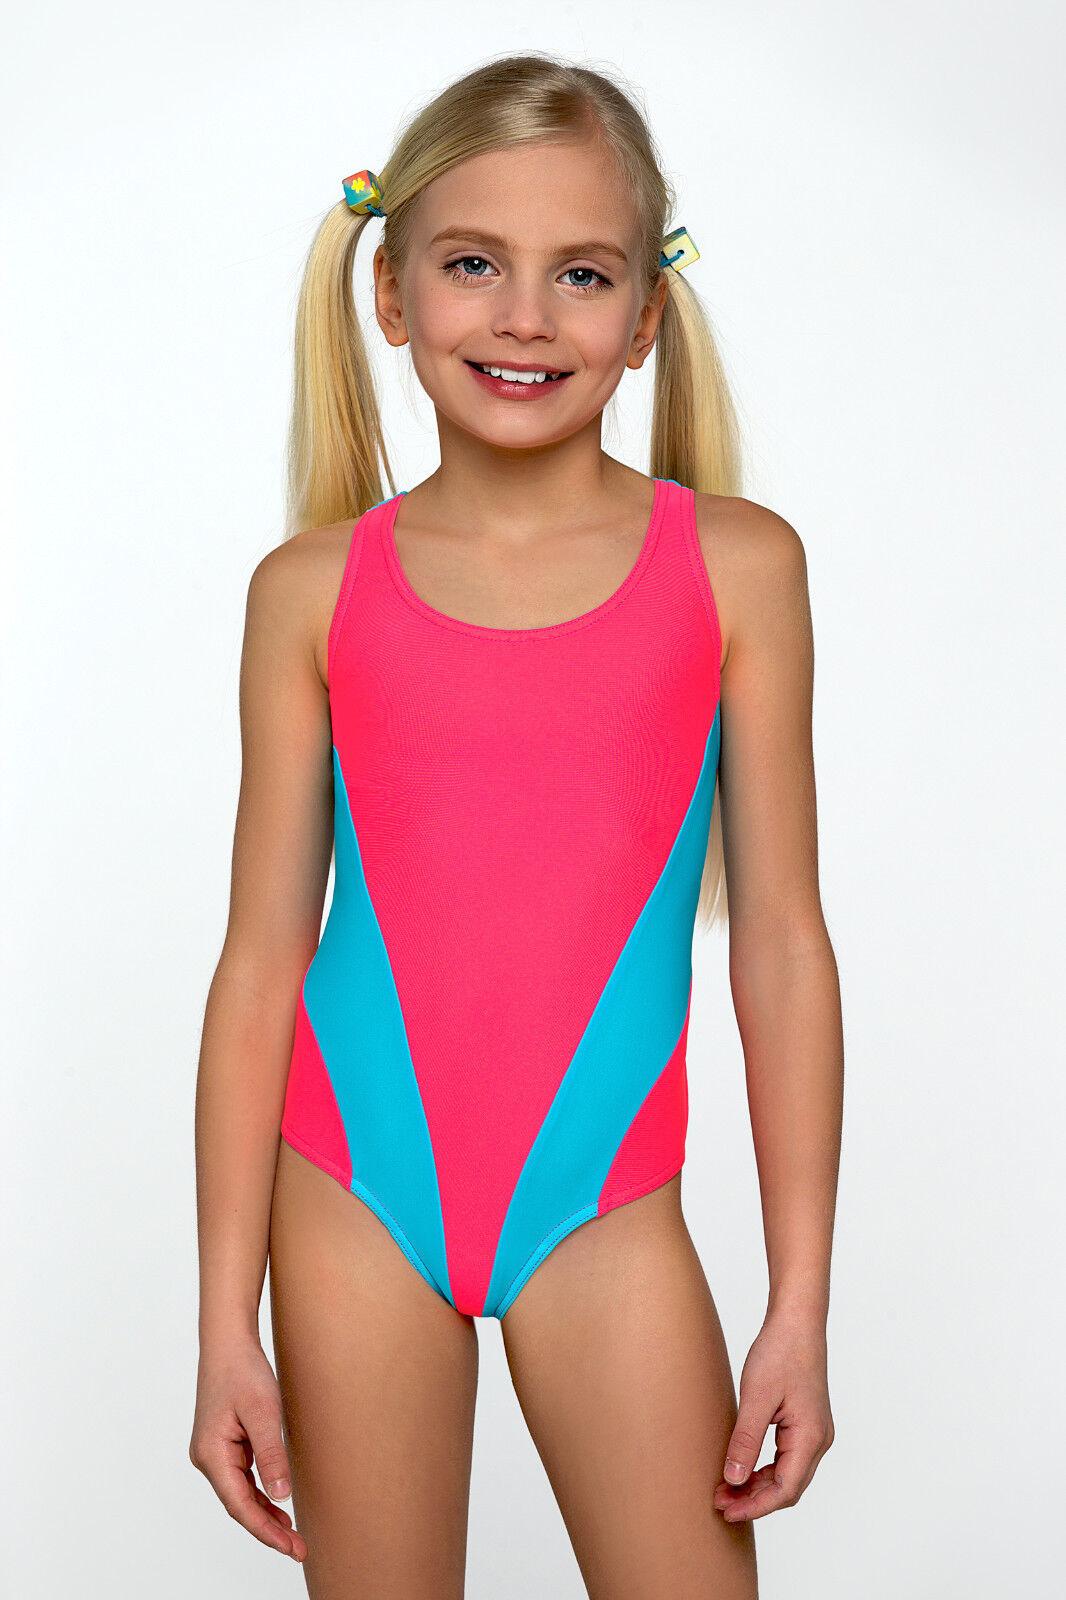 34ed3edb05d New Little Girls Sport Swimming Costume Swimwear Swimsuit Kids Age 3 4 5 6 7